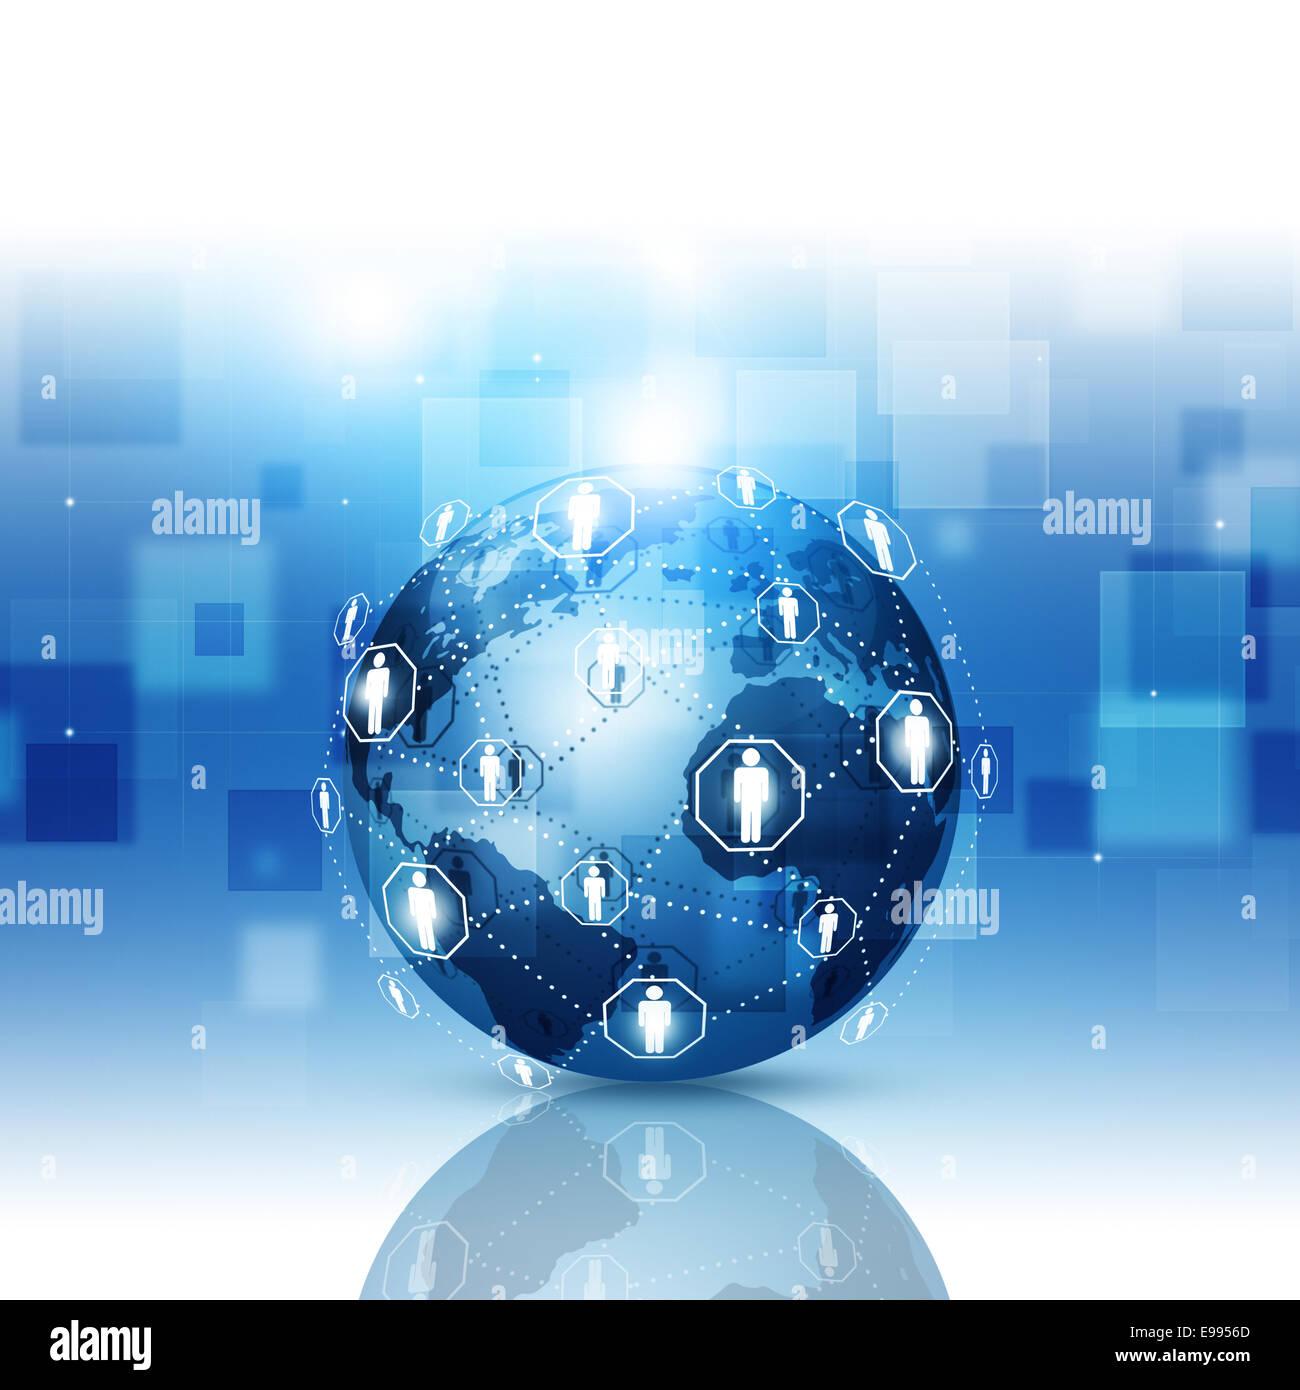 Abstract technology world connexion réseau global business background bleu Photo Stock